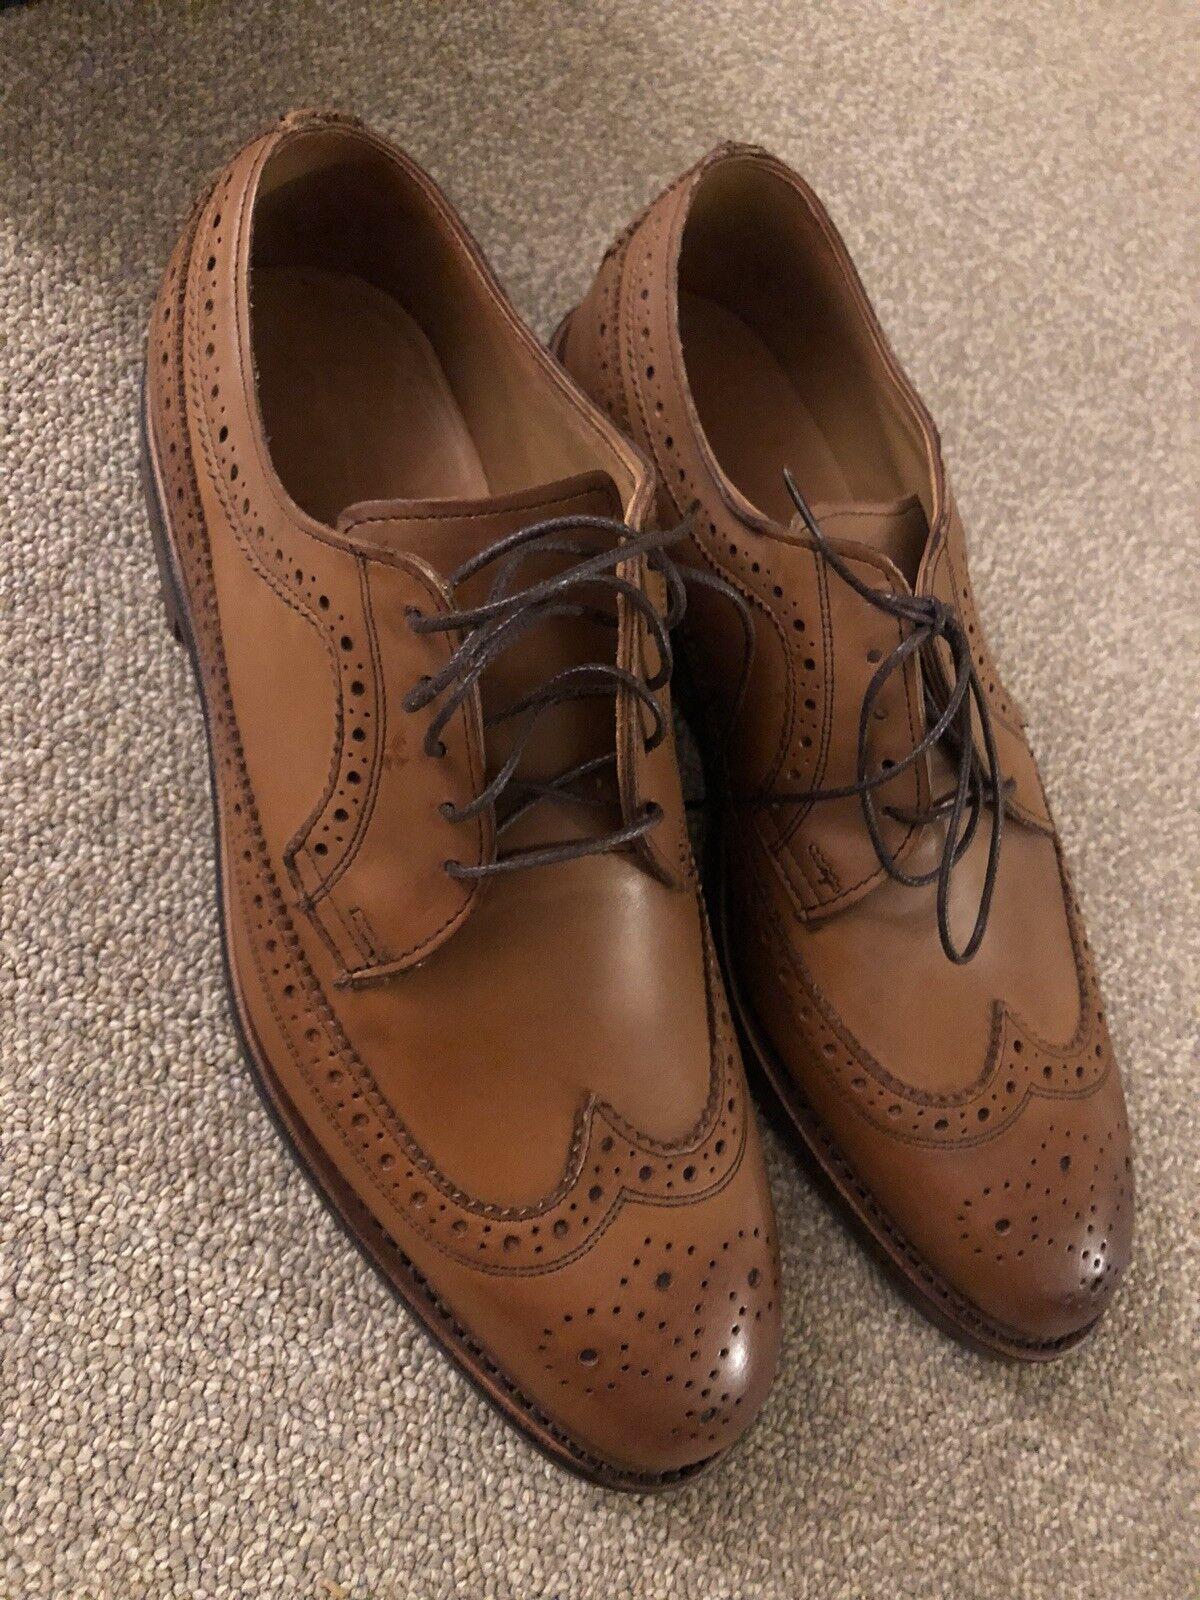 NEW Allen Edmonds for Polo Ralph Lauren Sanderson Long Wing Bluchers Tan 8D Scarpe classiche da uomo